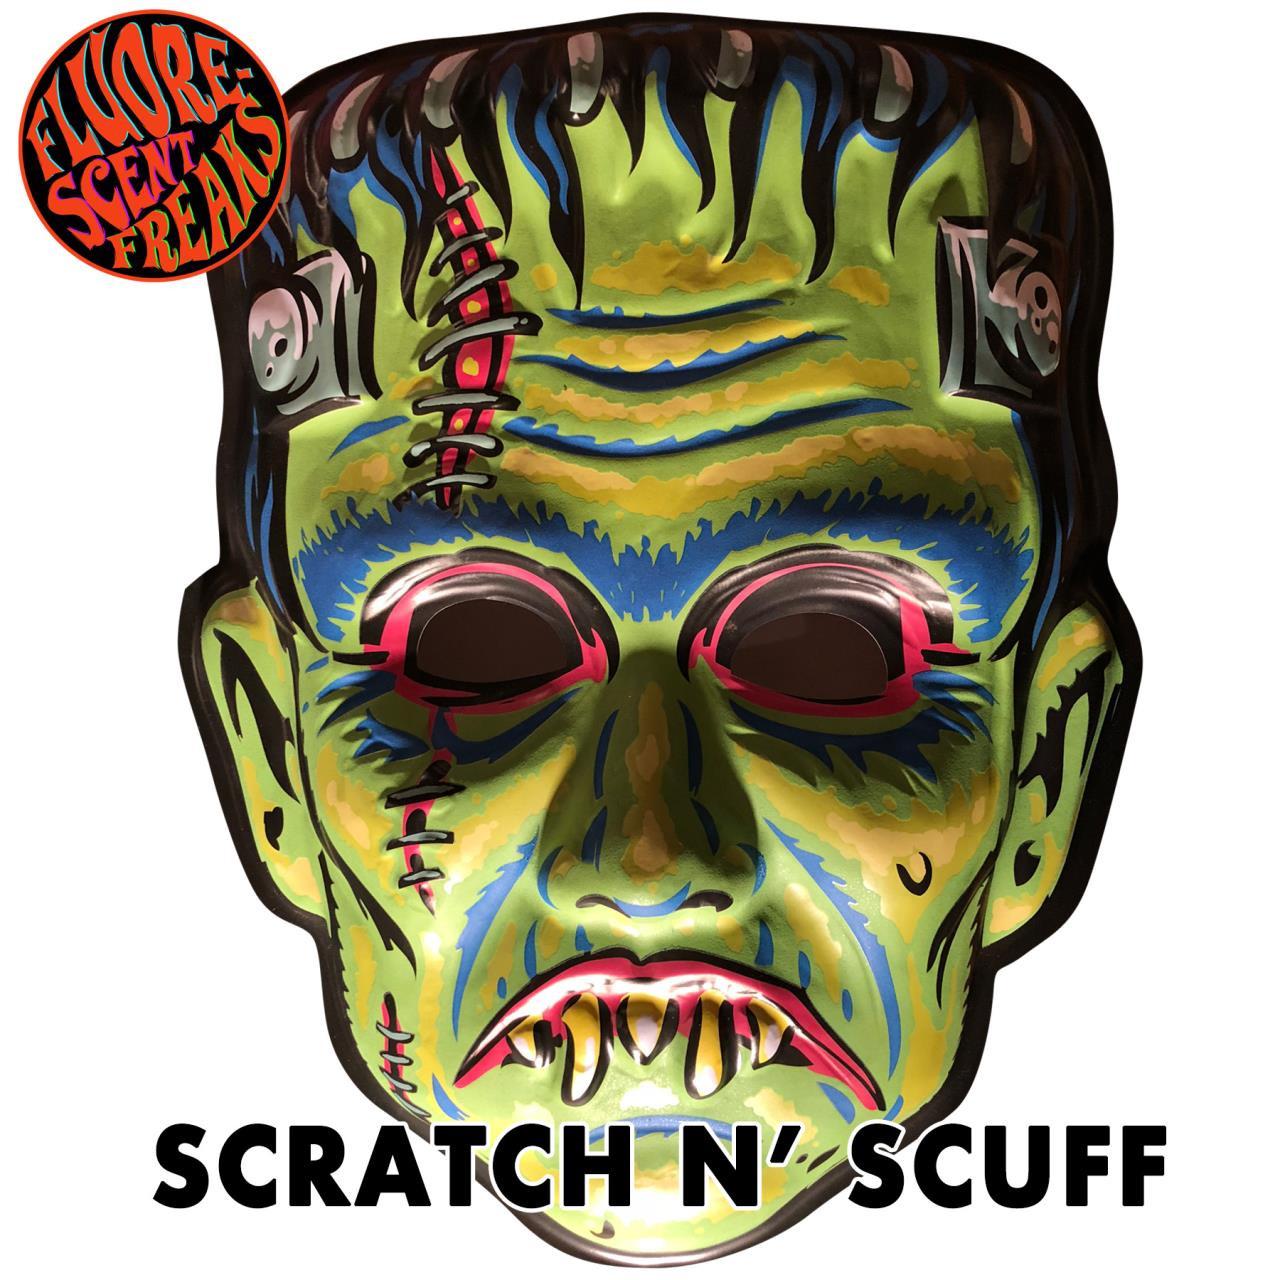 Scratch N' Scuff Son of Frankie Vac-tastic Plastic Mask -